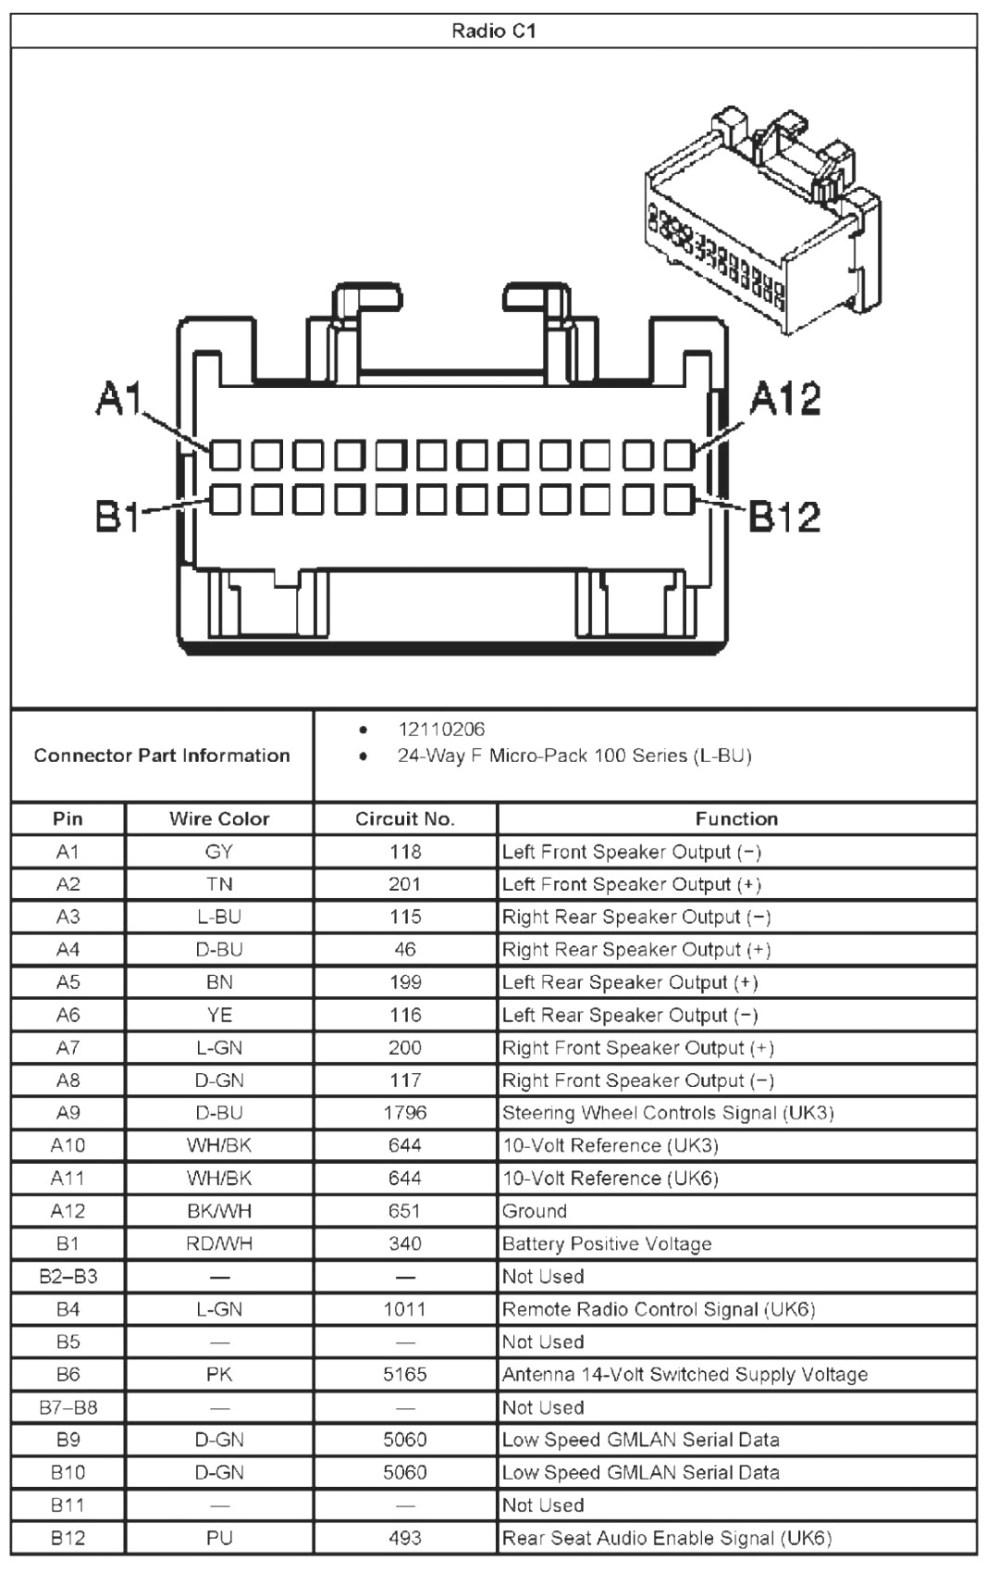 medium resolution of 2003 chevy impala radio wiring diagram download unique 2005 chevy impala radio wiring diagram ideas